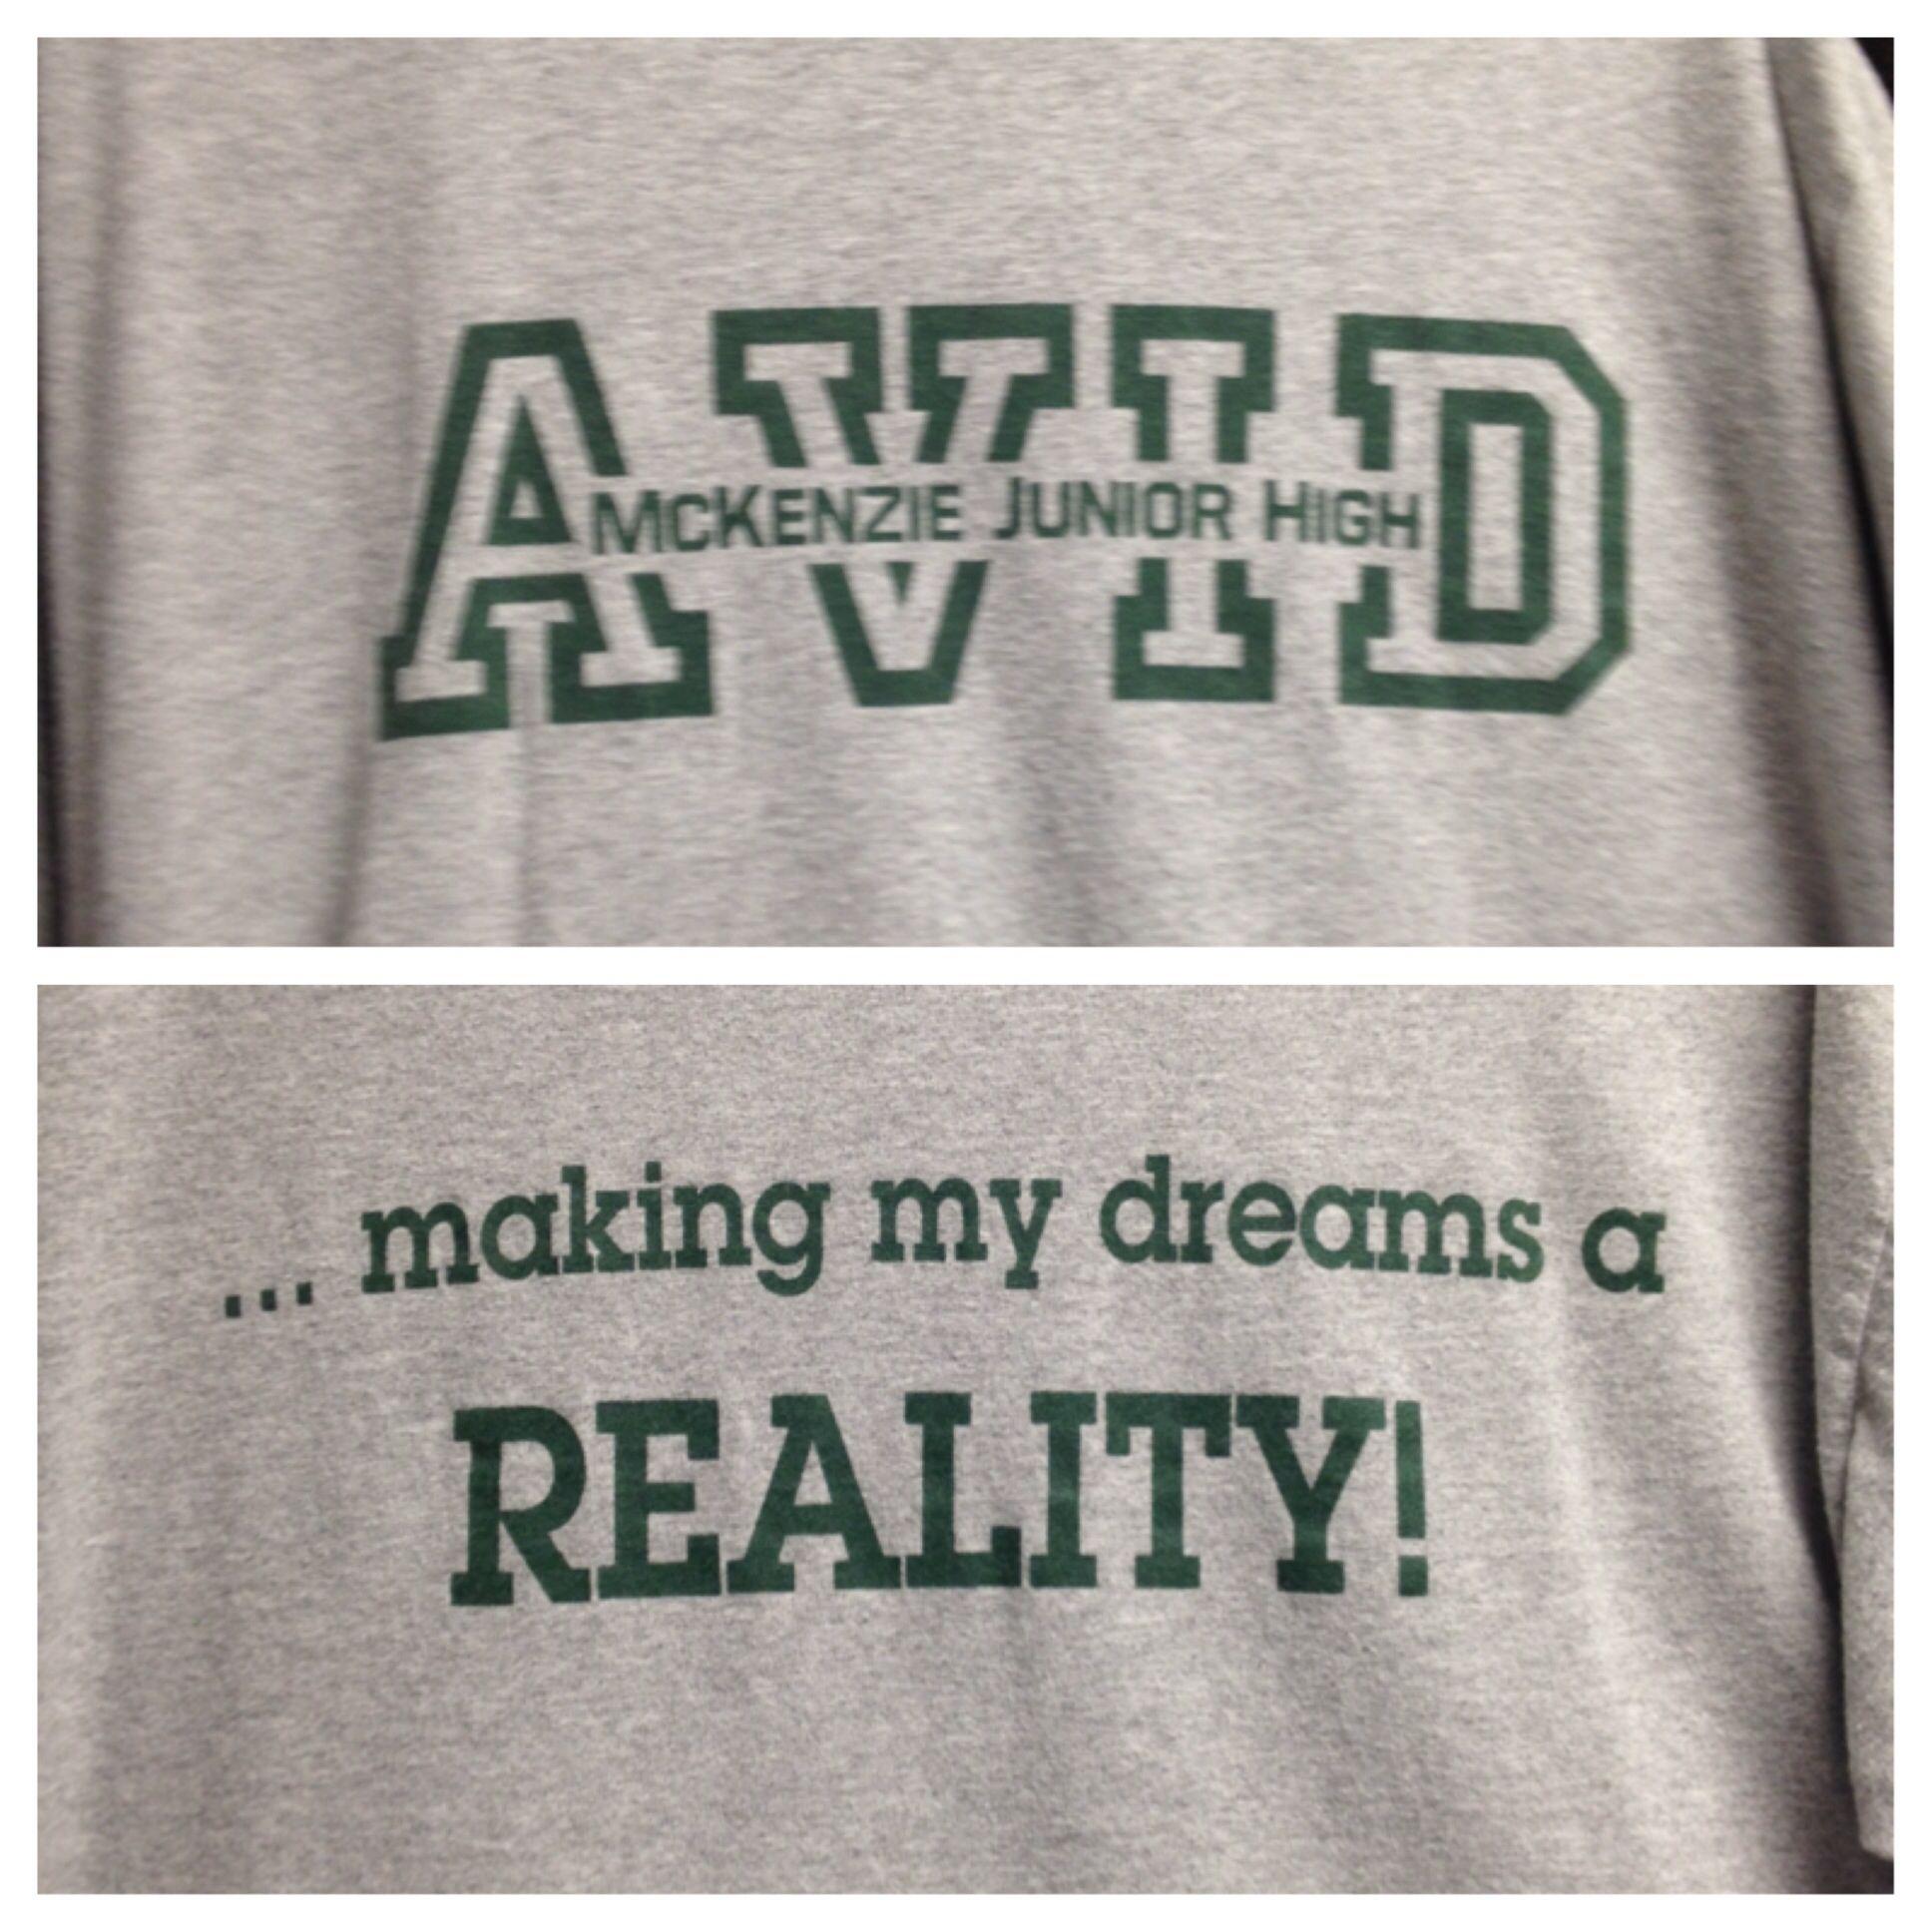 Avid t-shirt design | All things AVID | Pinterest | Avid ...